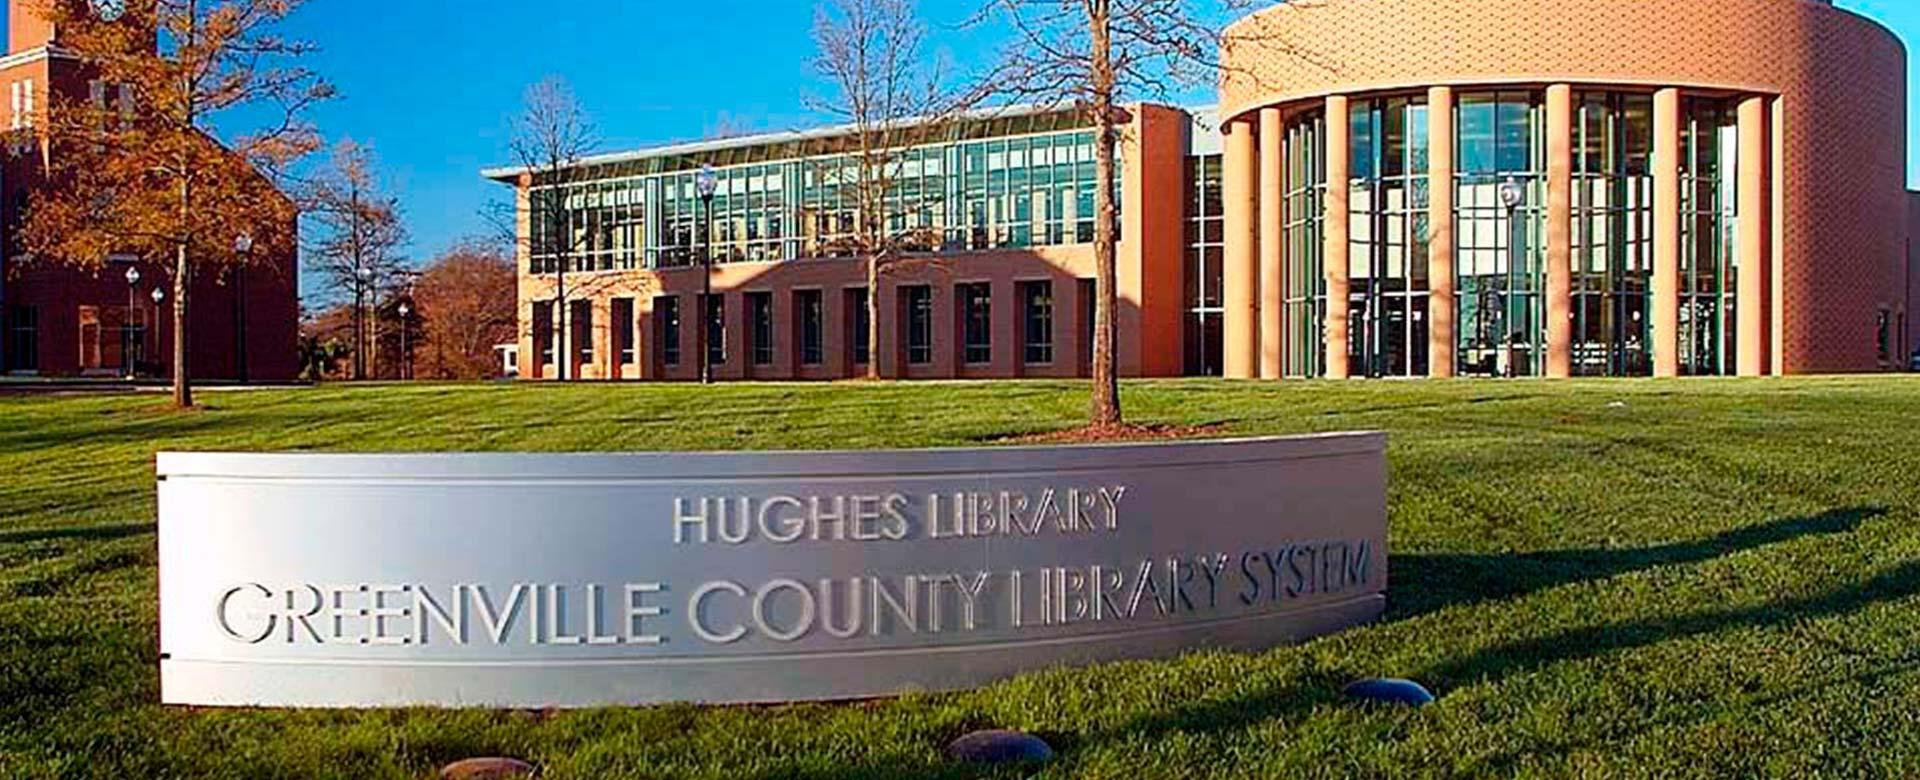 Hughes Main Library - Michael M. Simpson & Associates, Inc